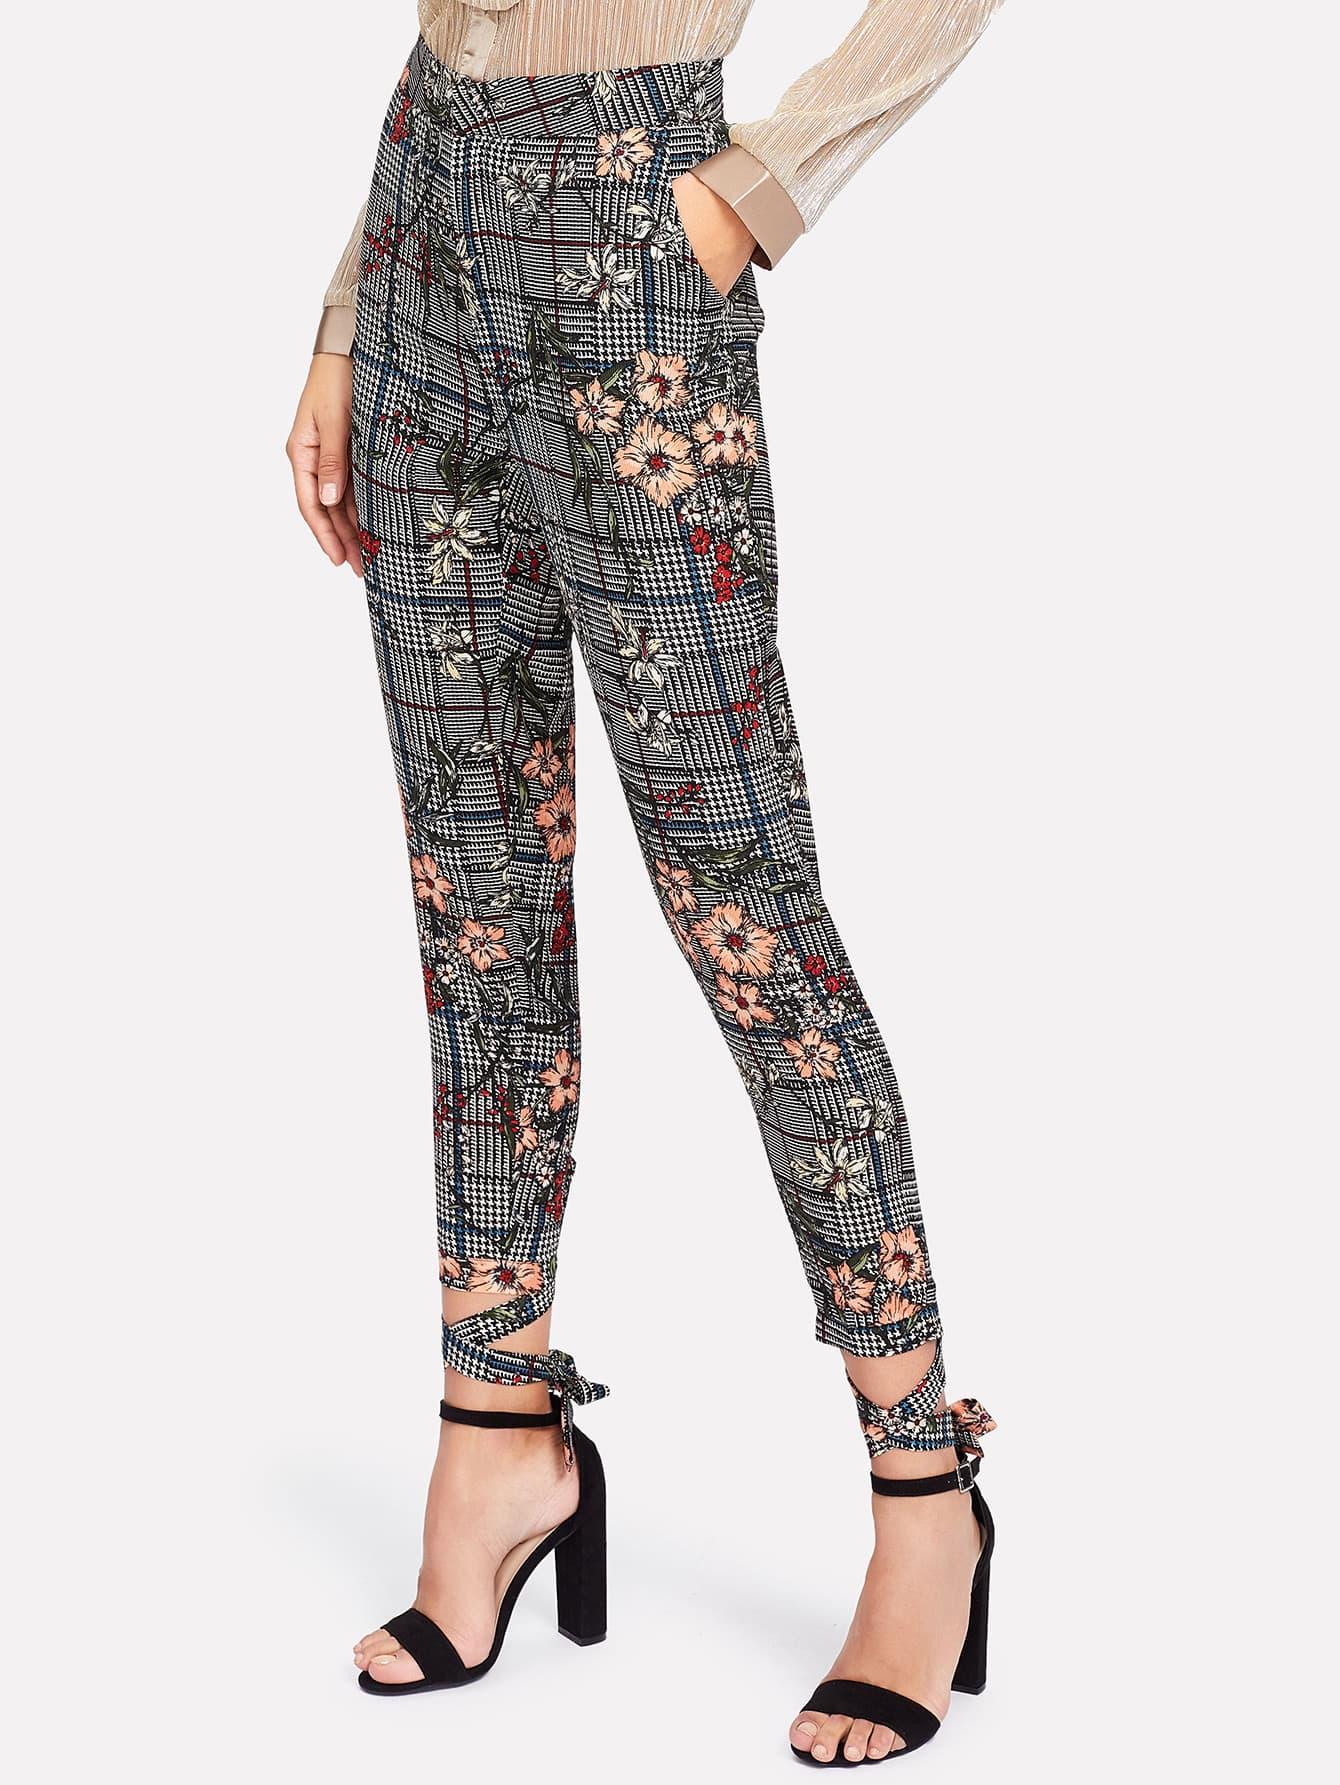 Plaid And Flower Print Pants